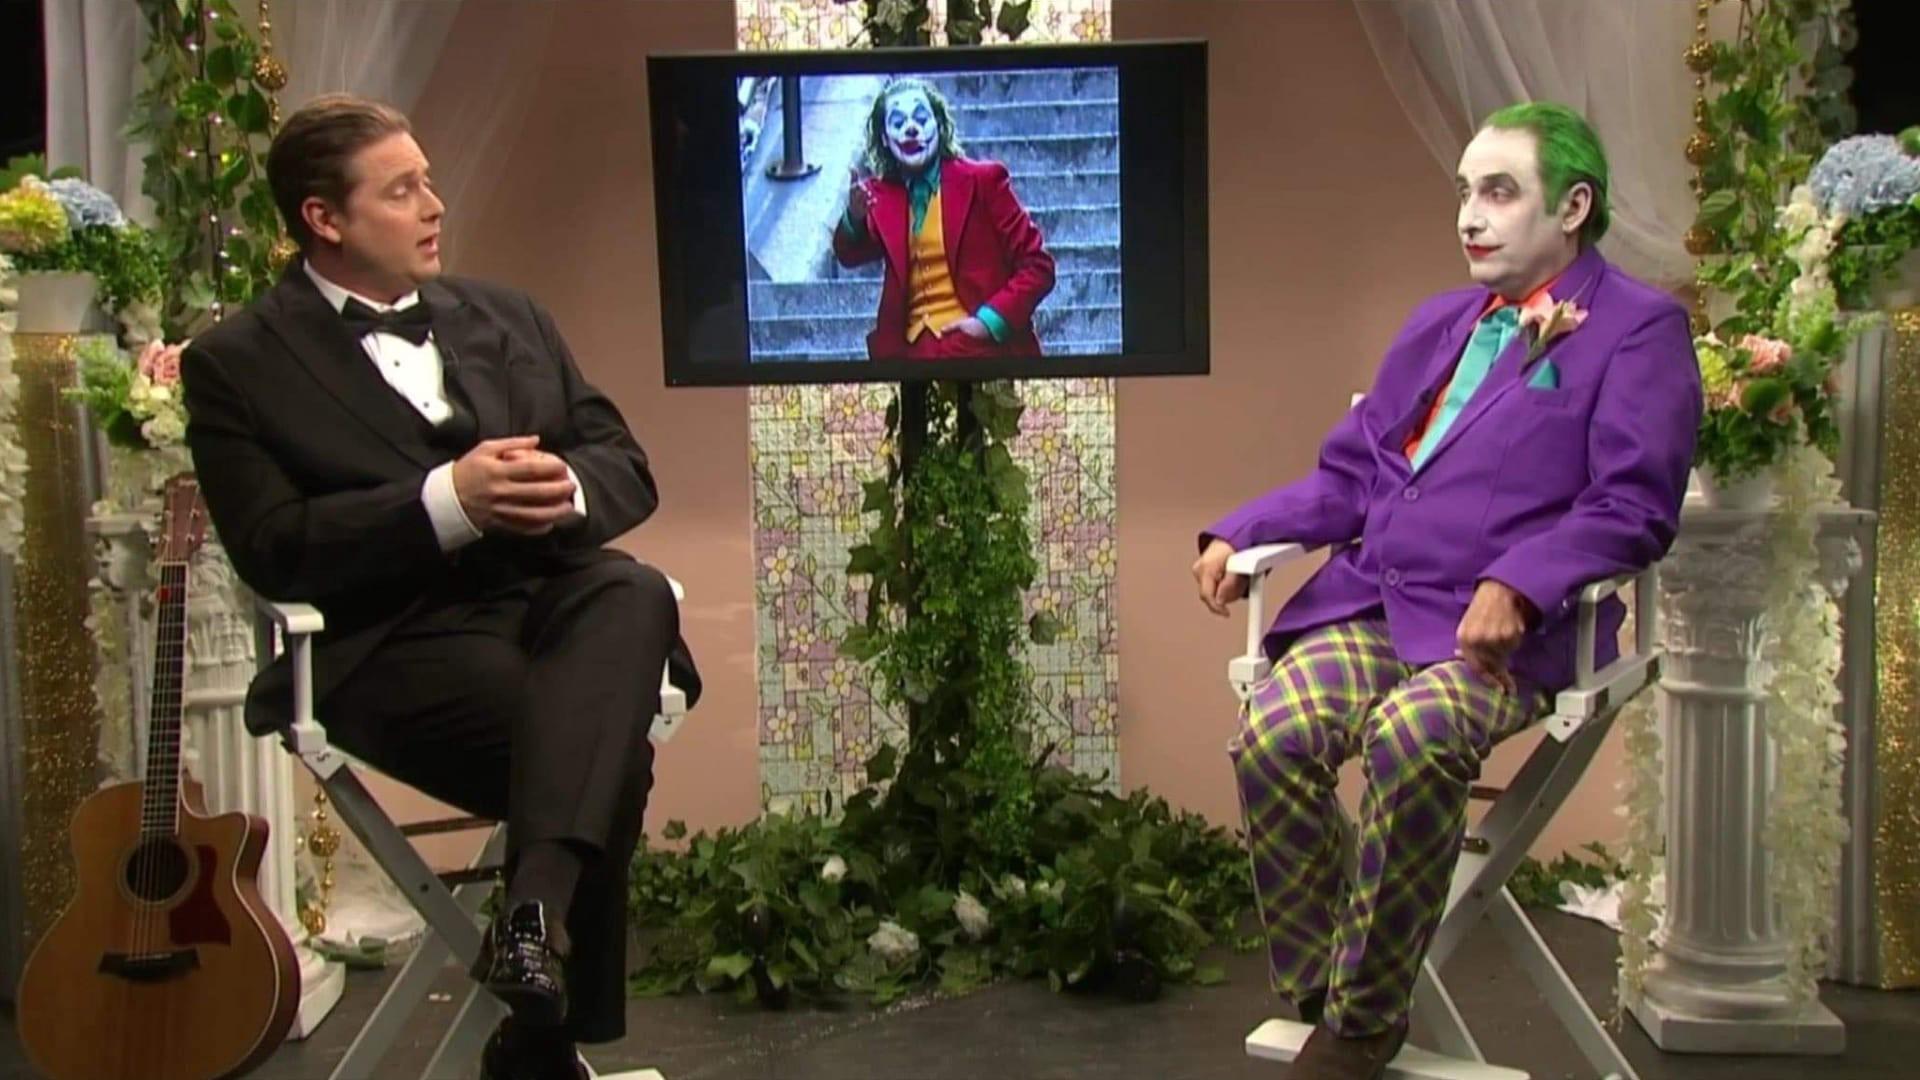 Gregg Turkington and Tim Heidecker in The Seventh Annual 'On Cinema' Oscar Special (2020)